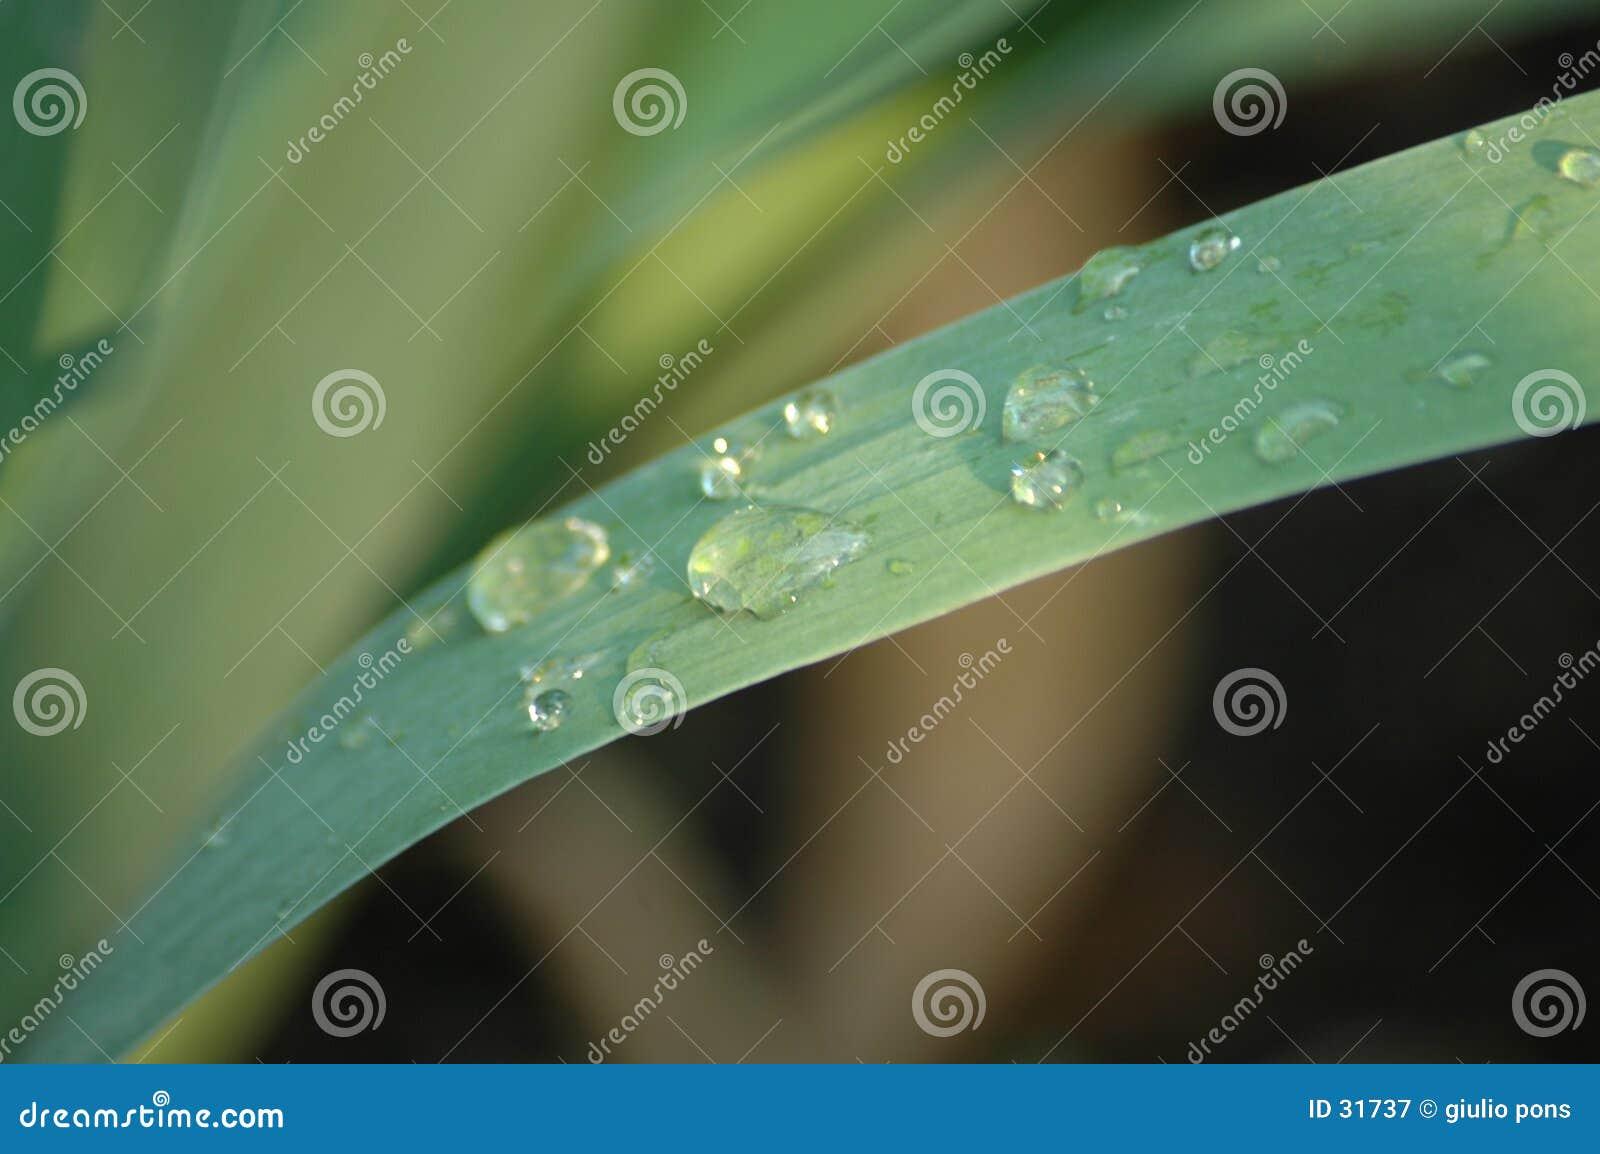 Lâmina de grama